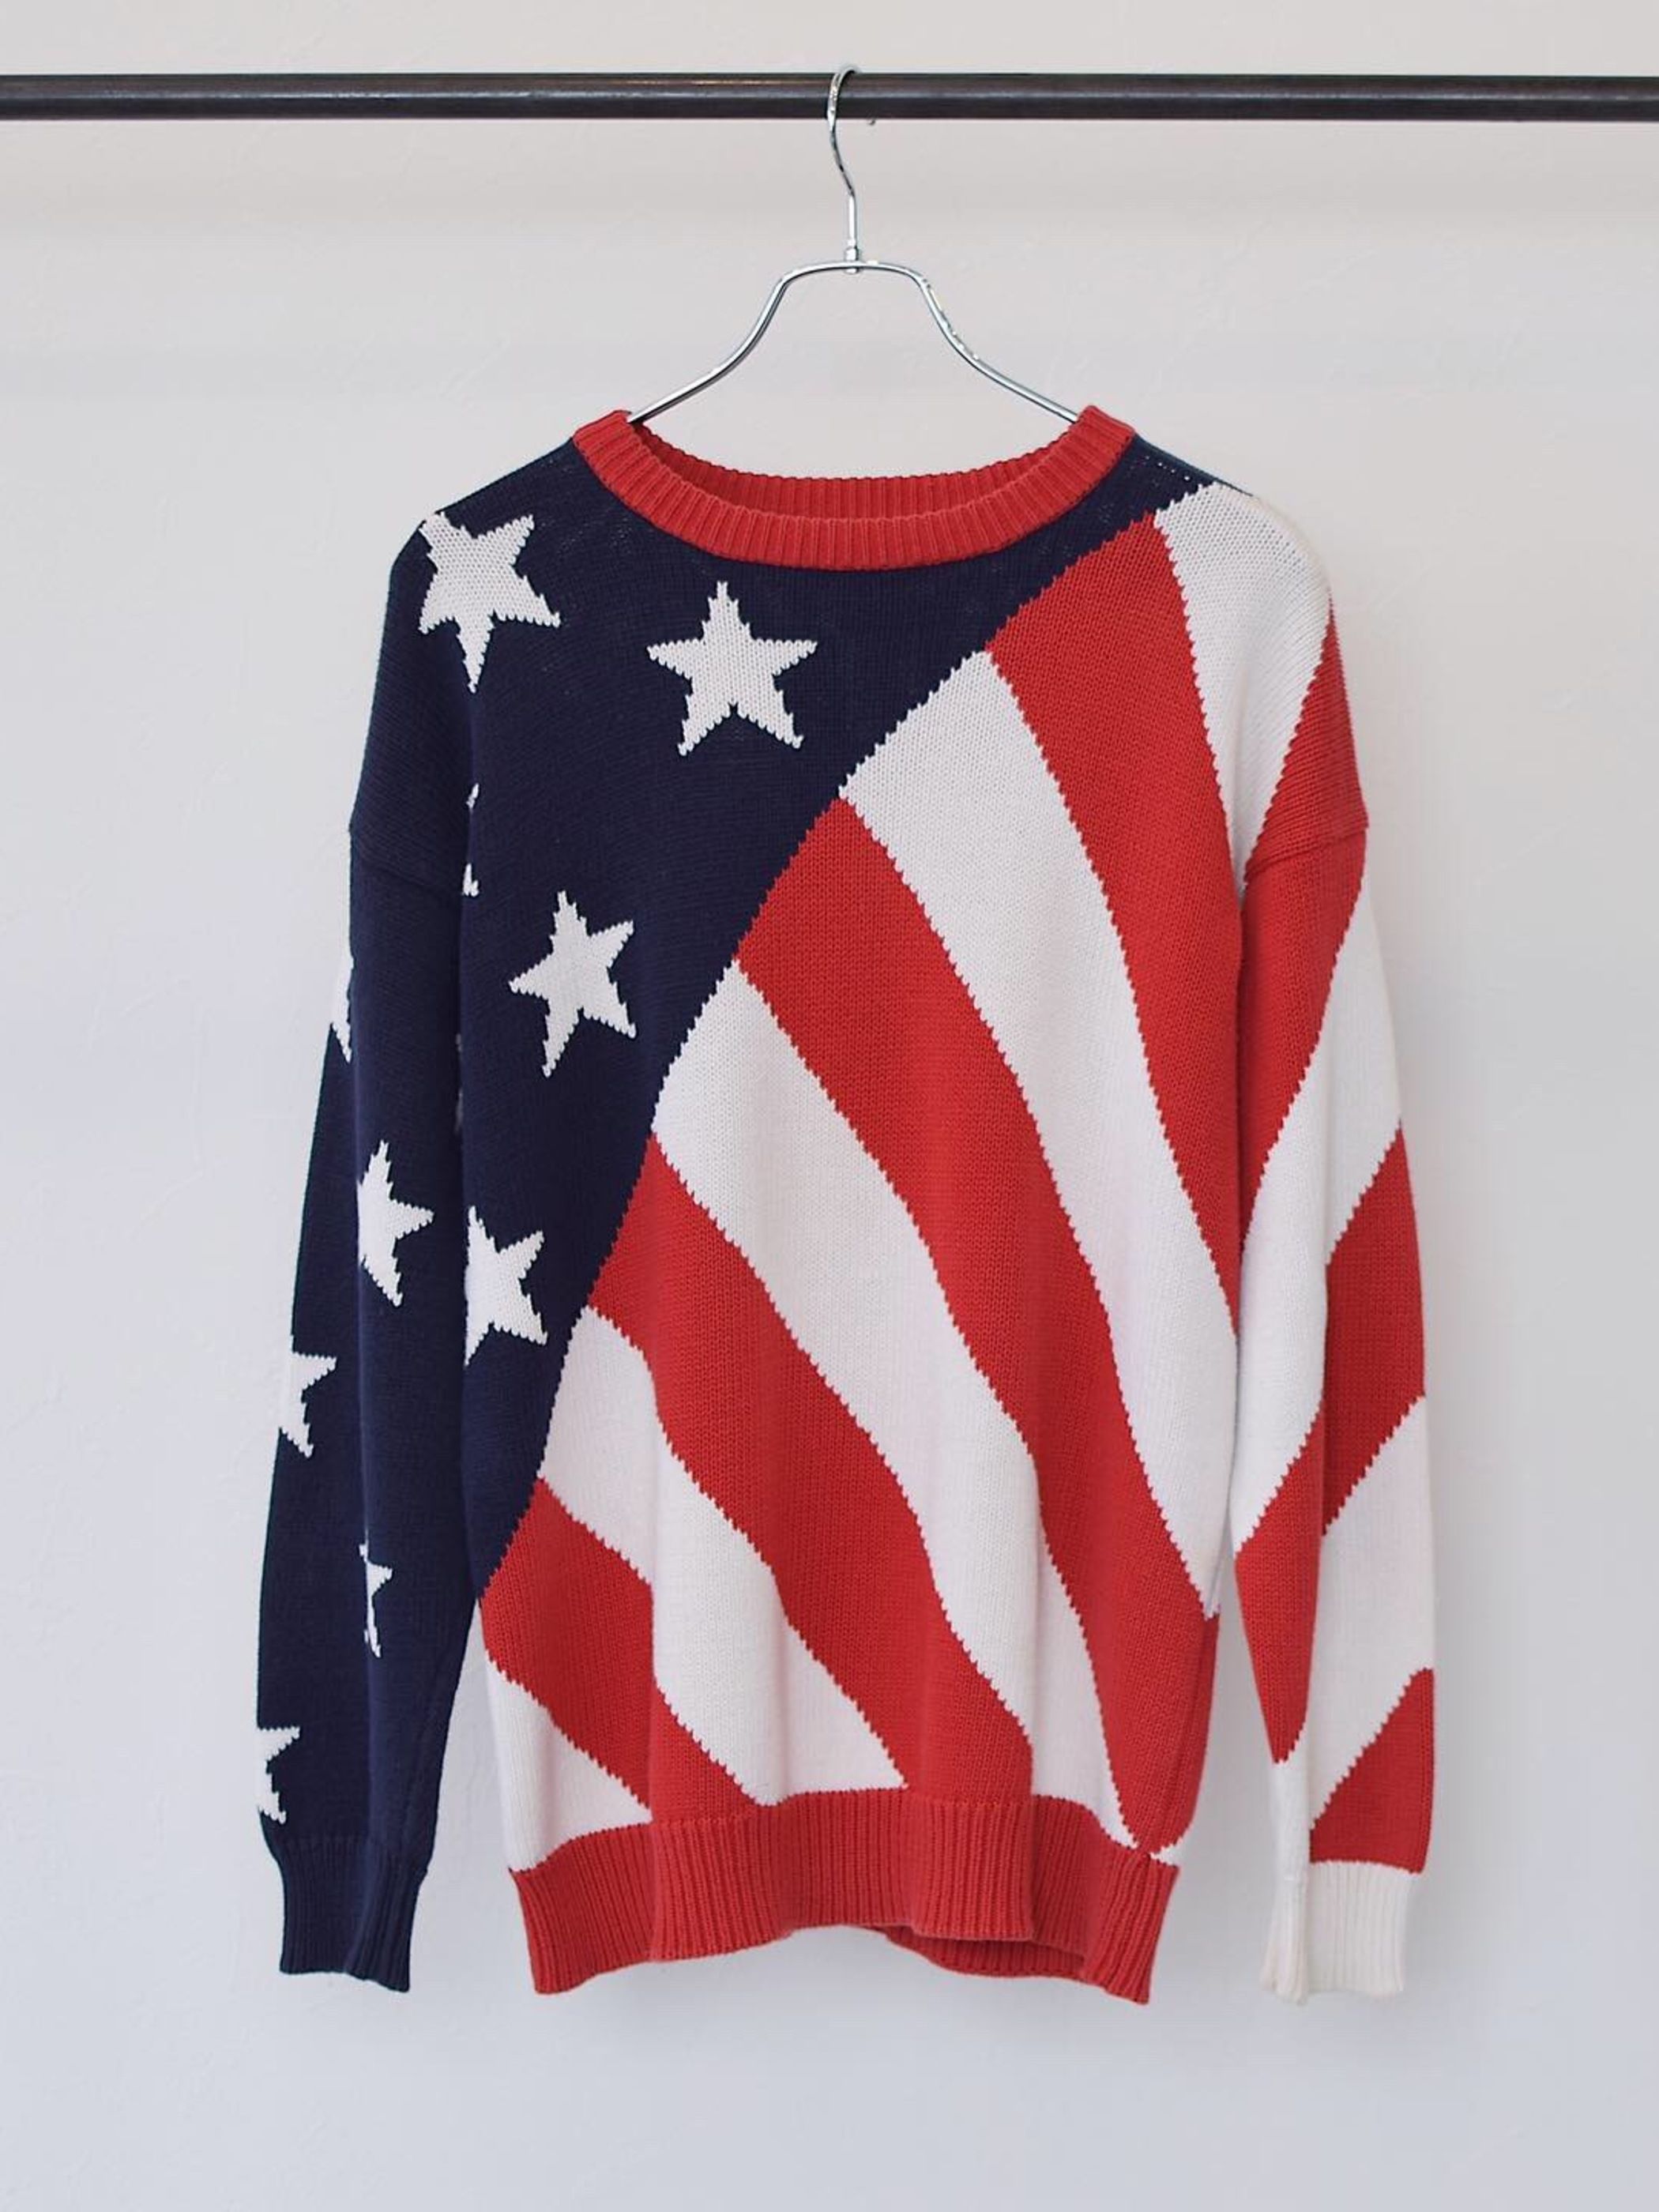 Vintage Stars and stripes Knit